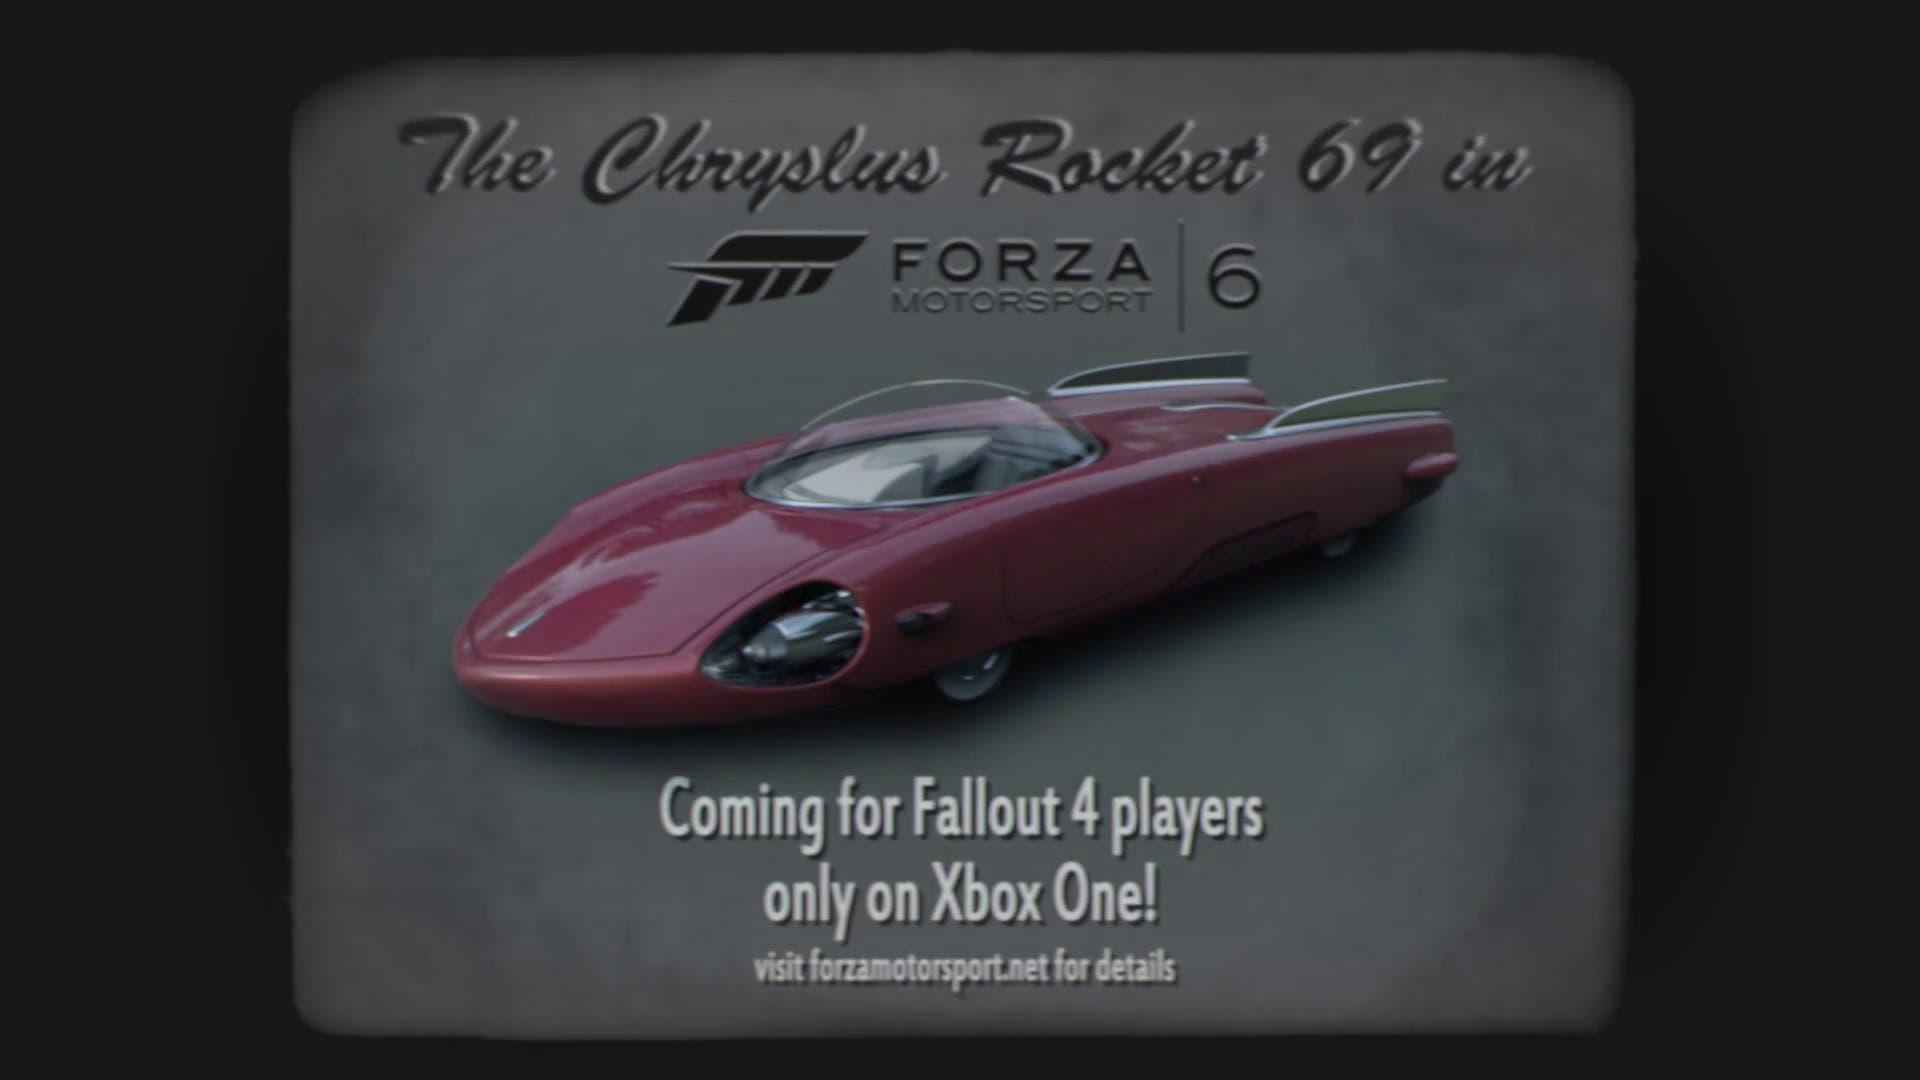 forza-6-chryslus-rocket-